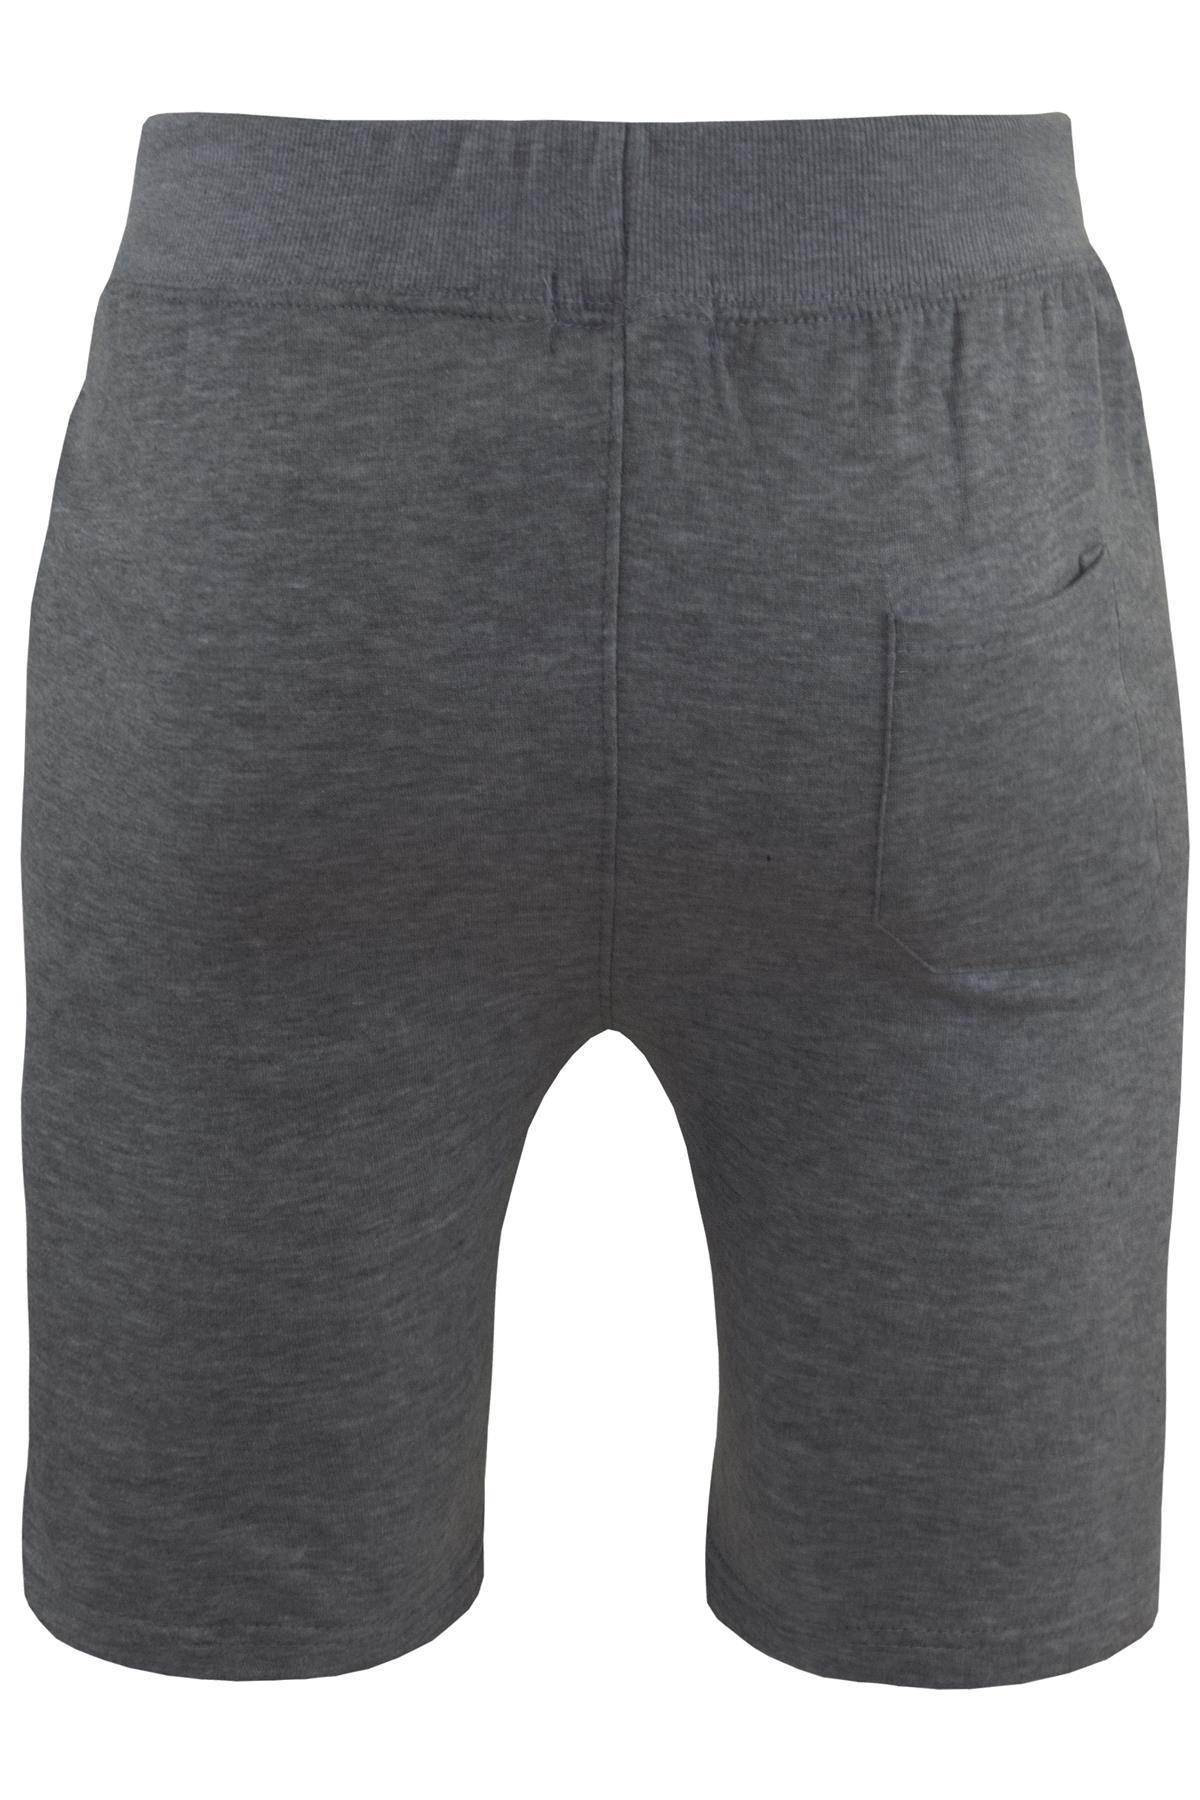 Mens-Contrast-Panel-Running-Summer-Side-Slit-Knee-Length-Fleece-Bottoms-Shorts thumbnail 48